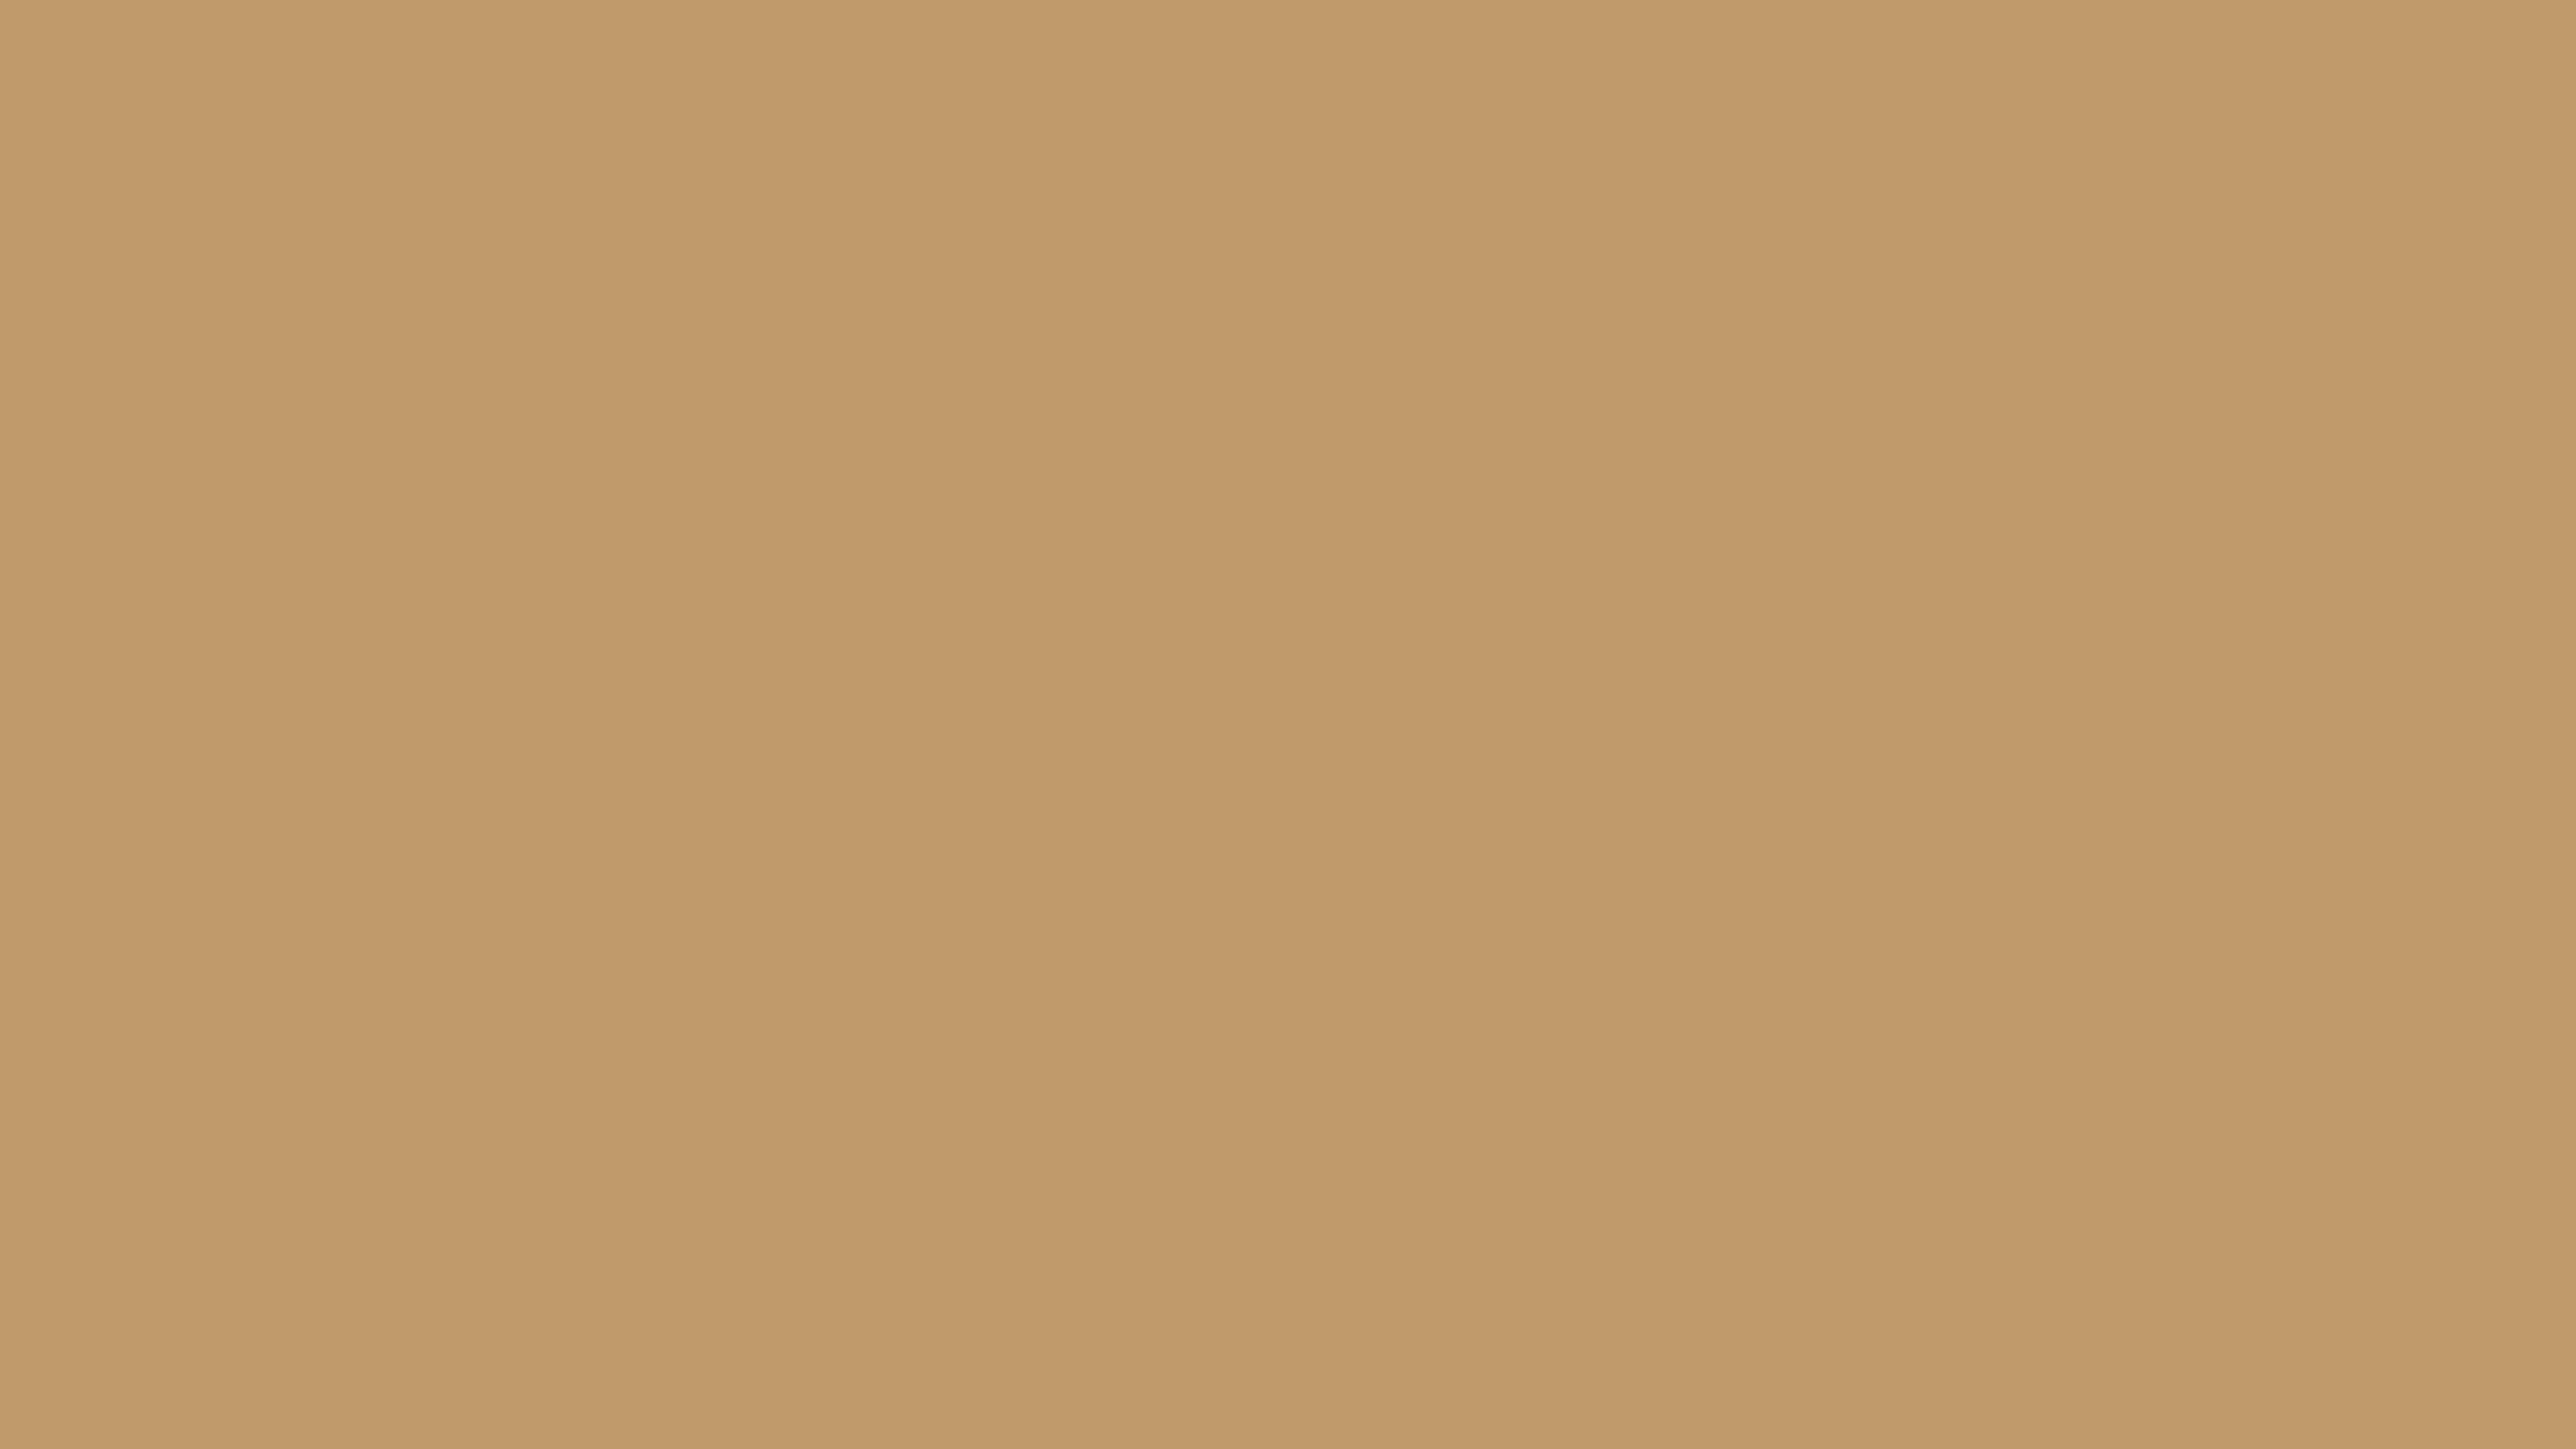 4096x2304 Desert Solid Color Background